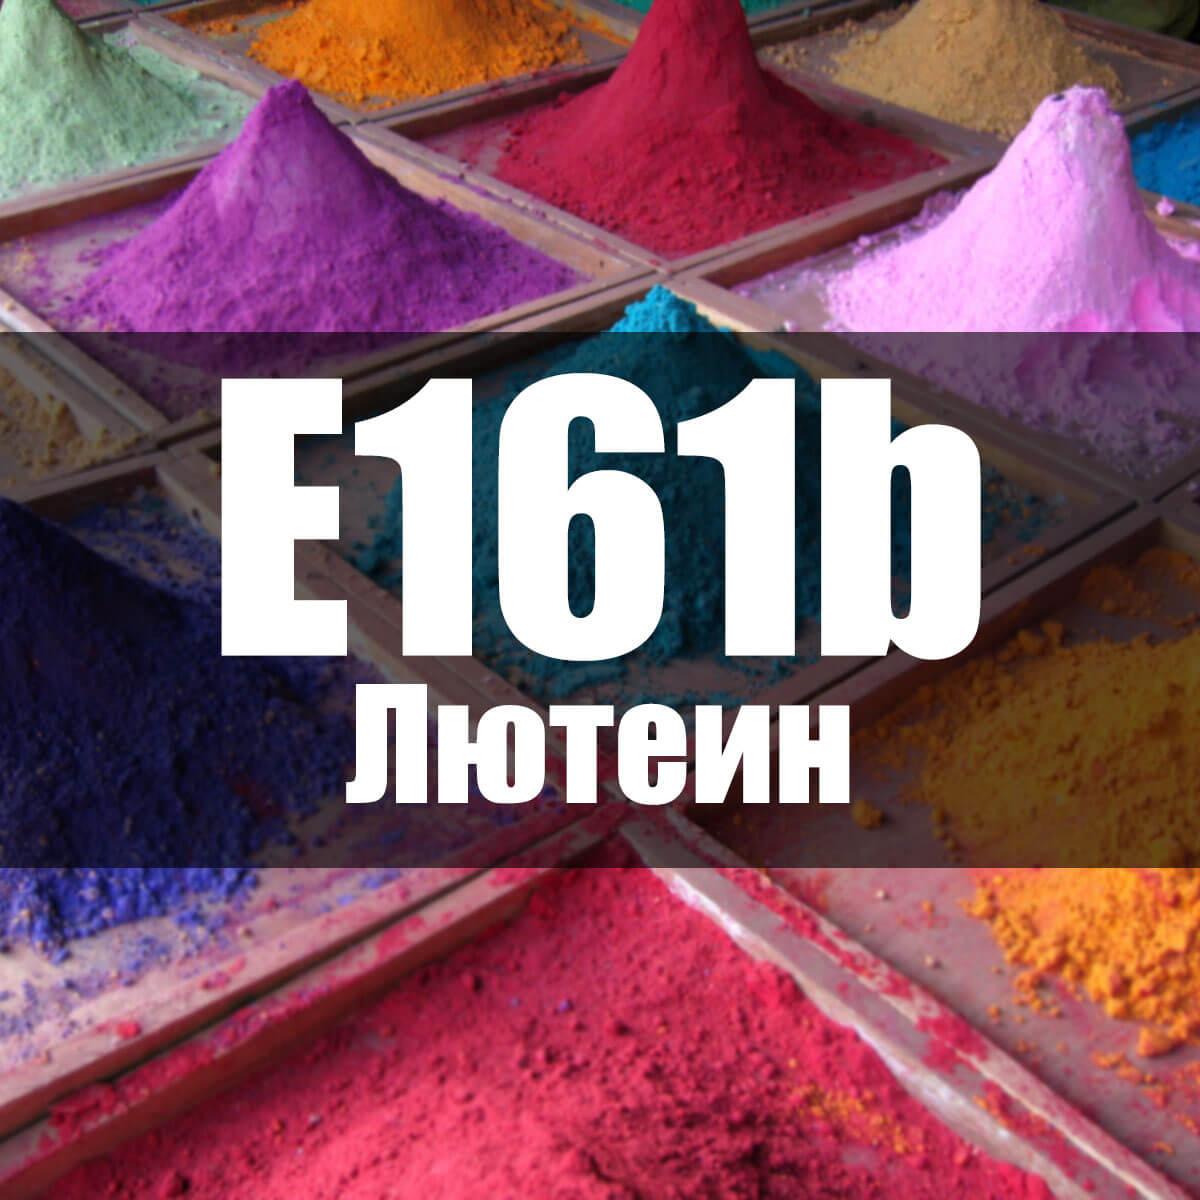 Лютеин (Е161b): история, польза, вред